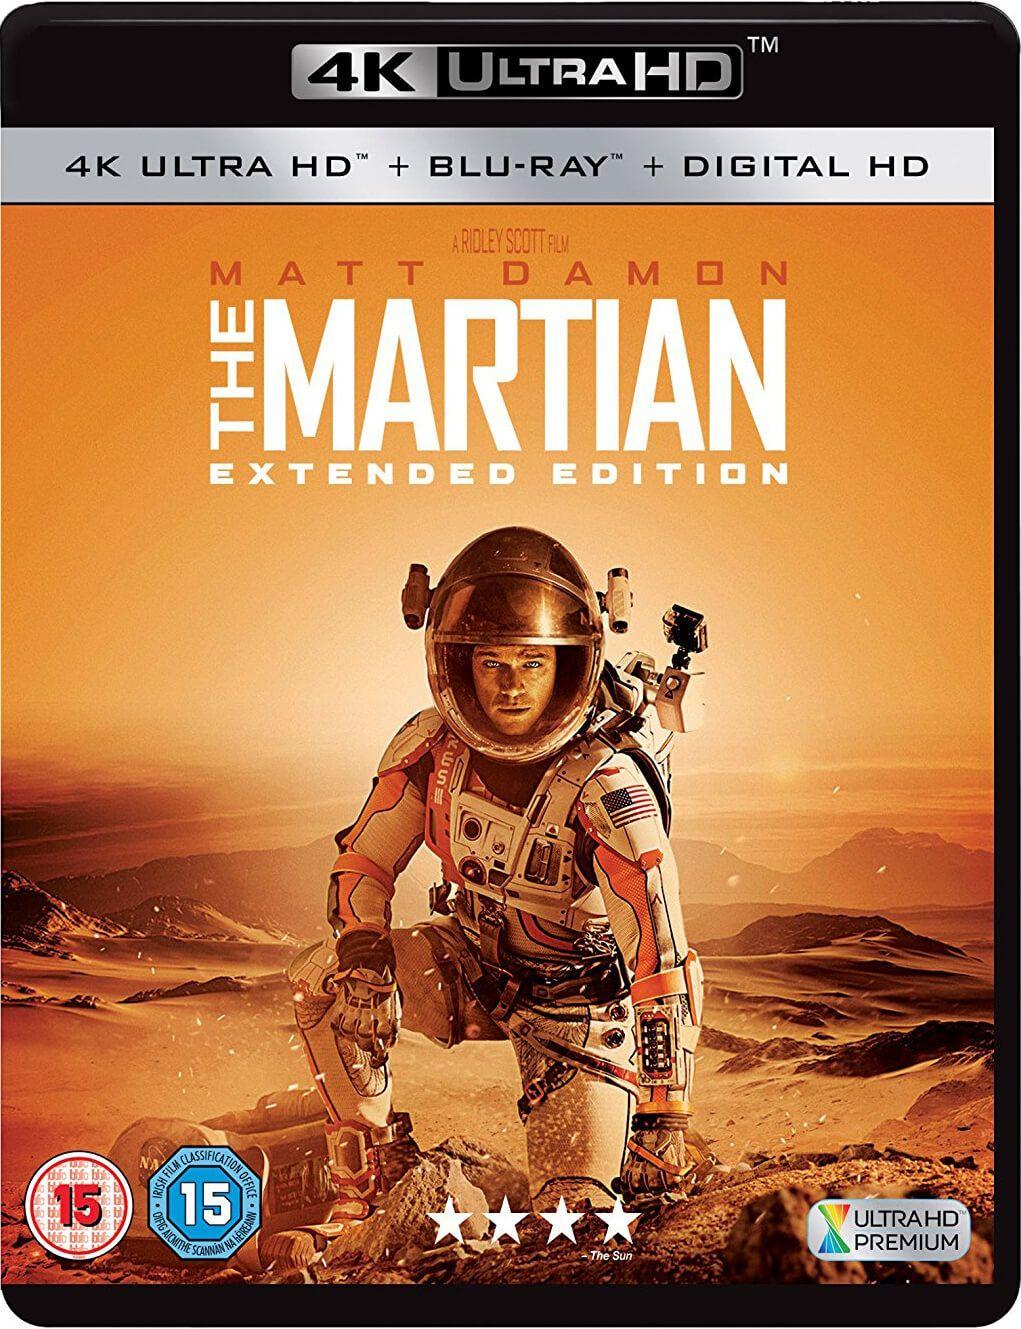 The Martian 2015 EXTENDED MULTi VF2 2160p UHD BluRay 4KLight HDR HEVC DTS 5 1-Shiro